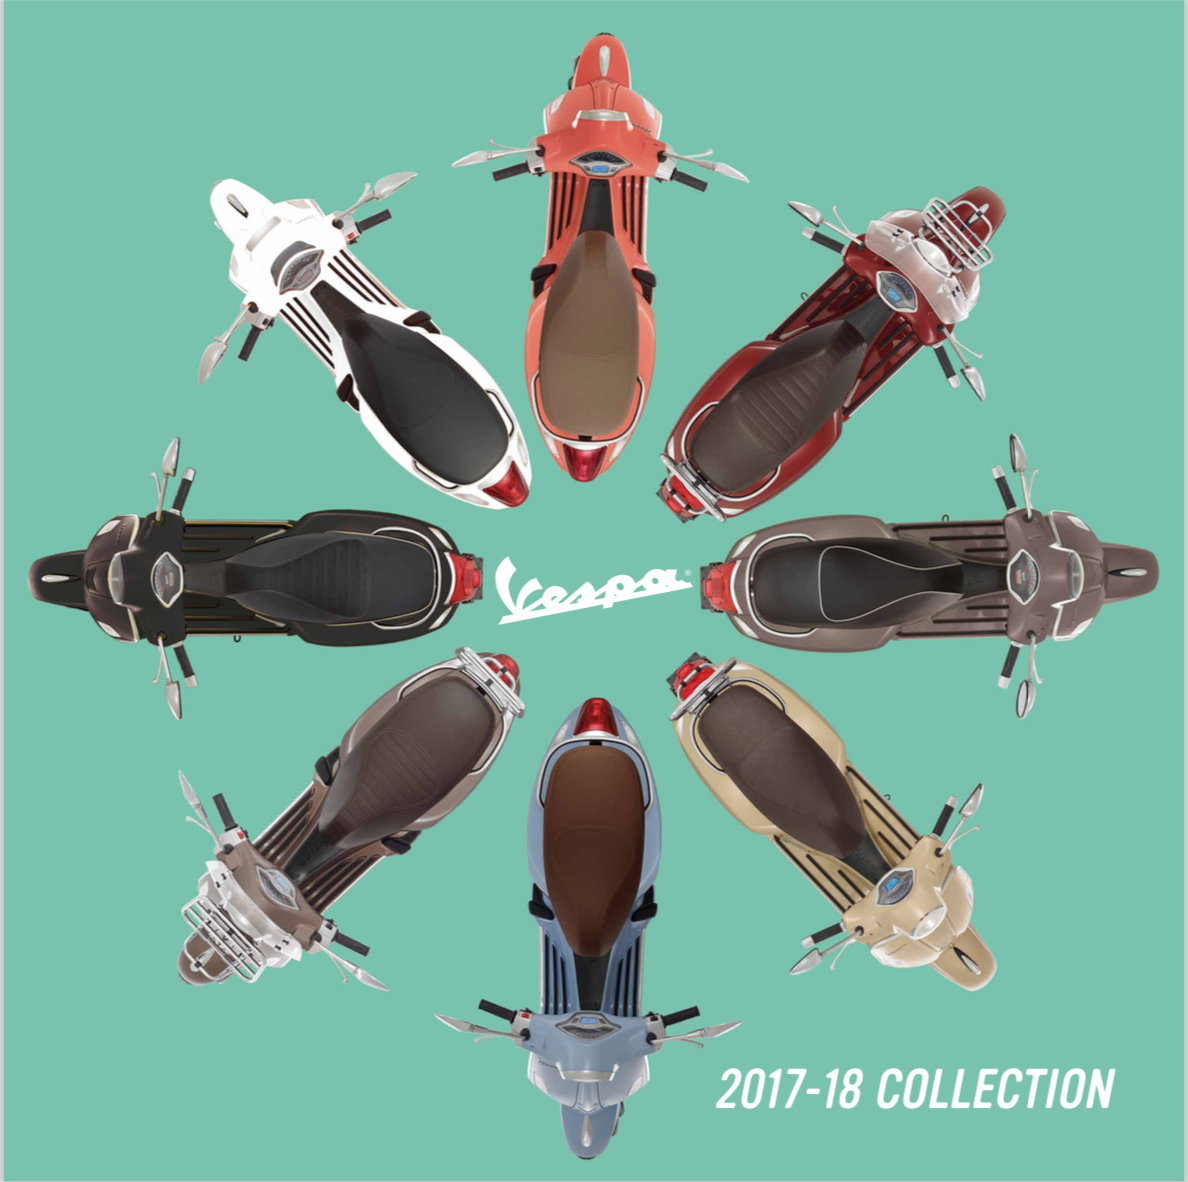 2018 Vespa vehicle cover